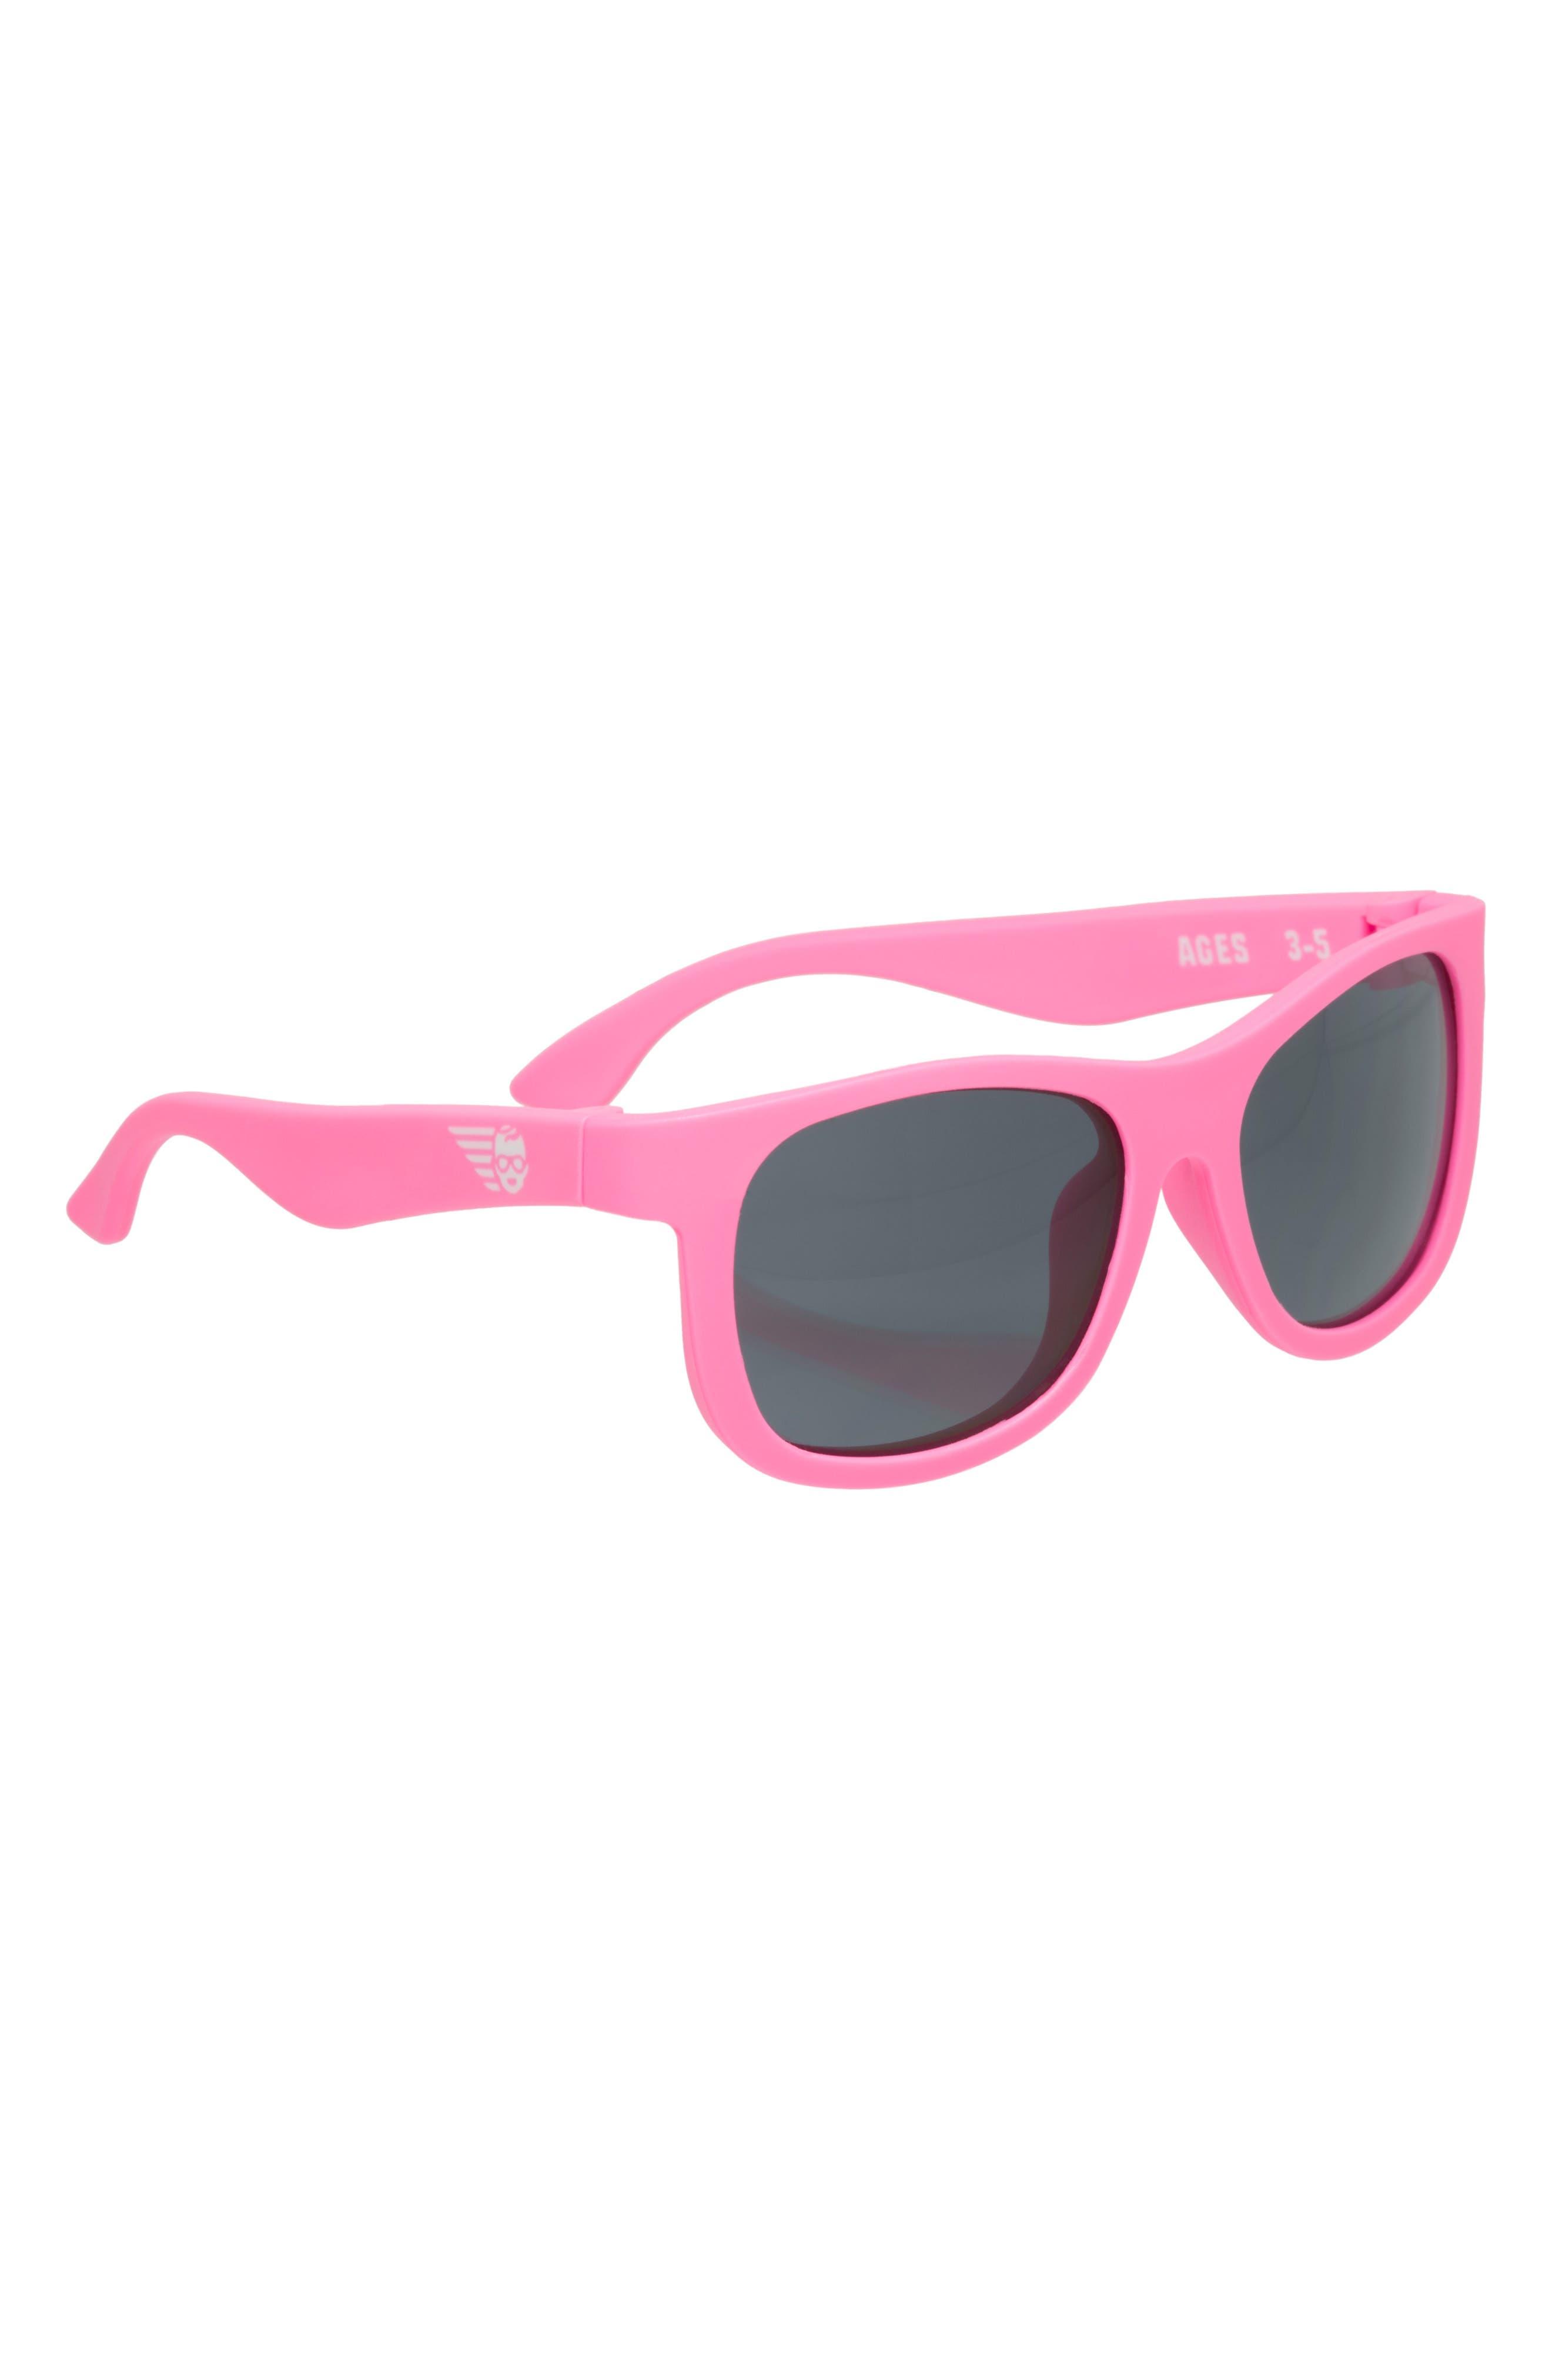 Original Navigators Sunglasses,                             Alternate thumbnail 8, color,